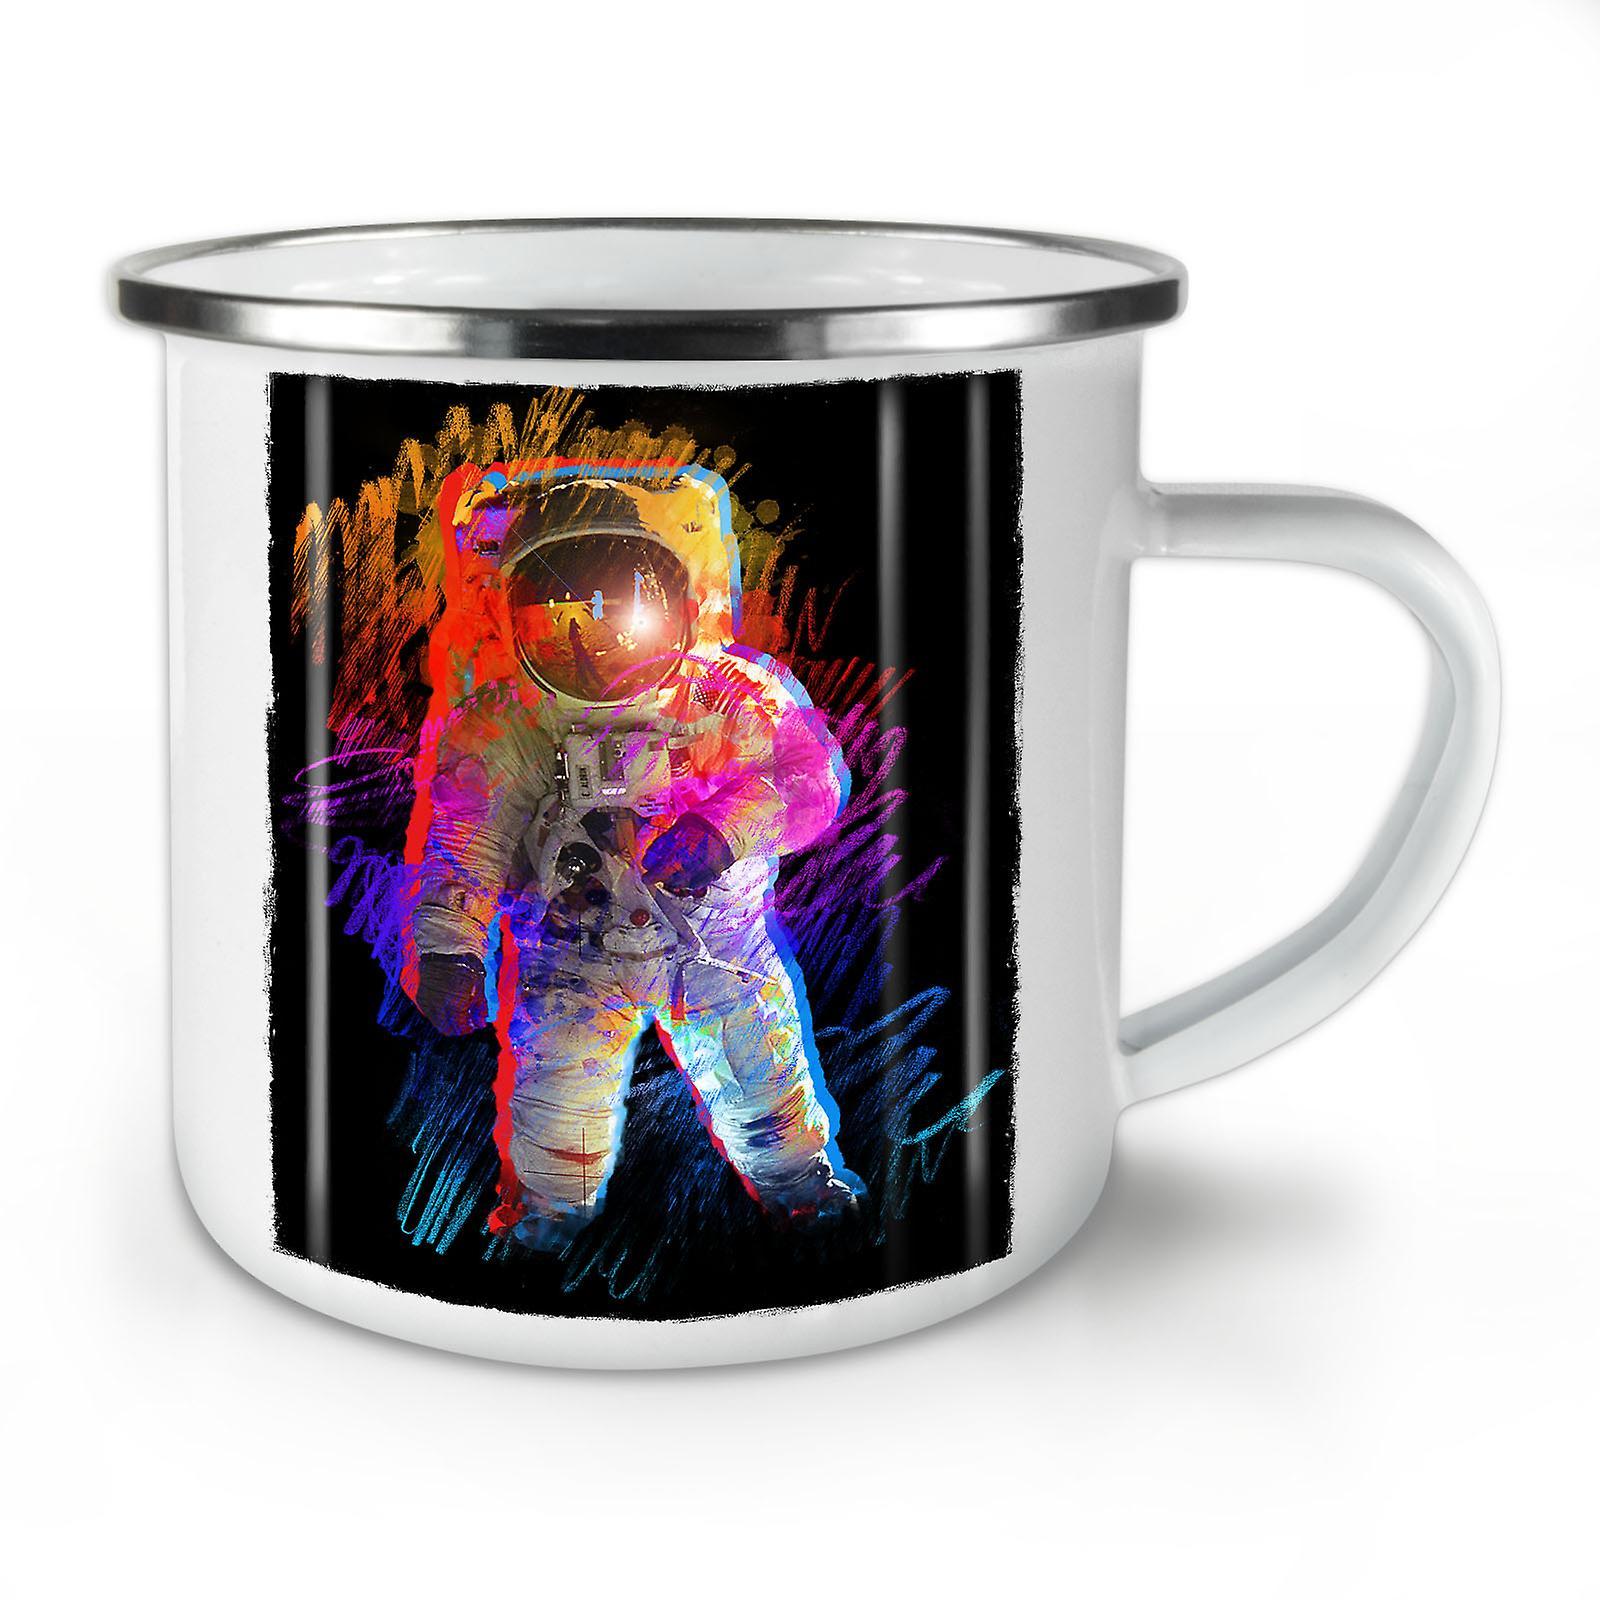 Moon New Coffee Man Mug10 OzWellcoda Whitetea Enamel Walk Of Space doeBrCx